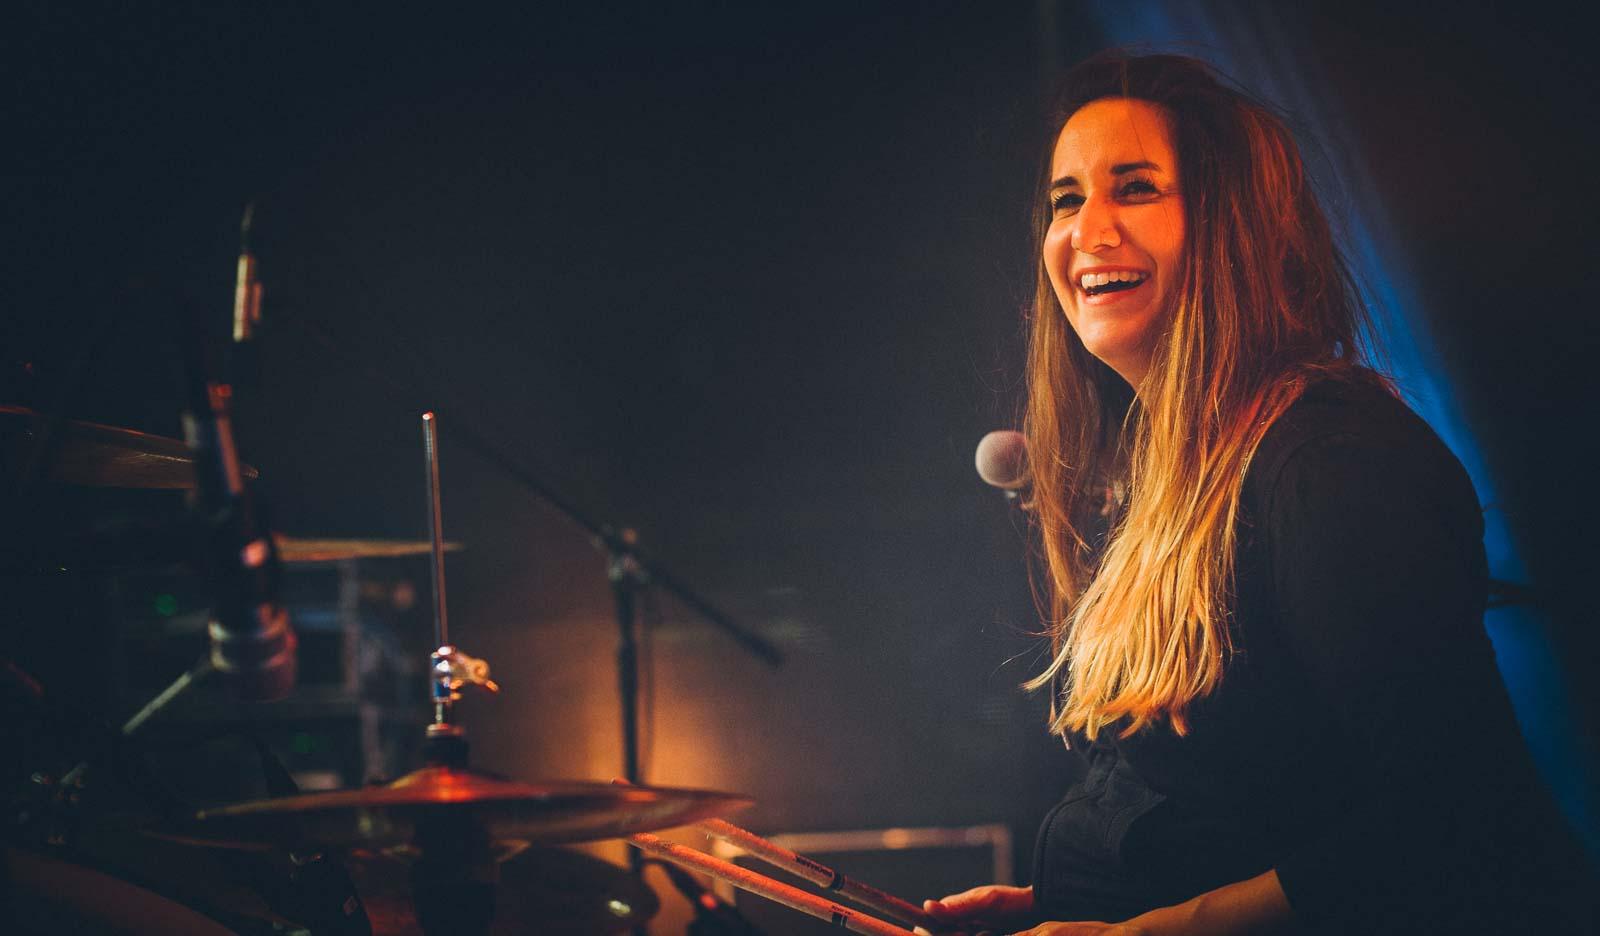 Drummerin lacht – Konzert Fotos Berlin